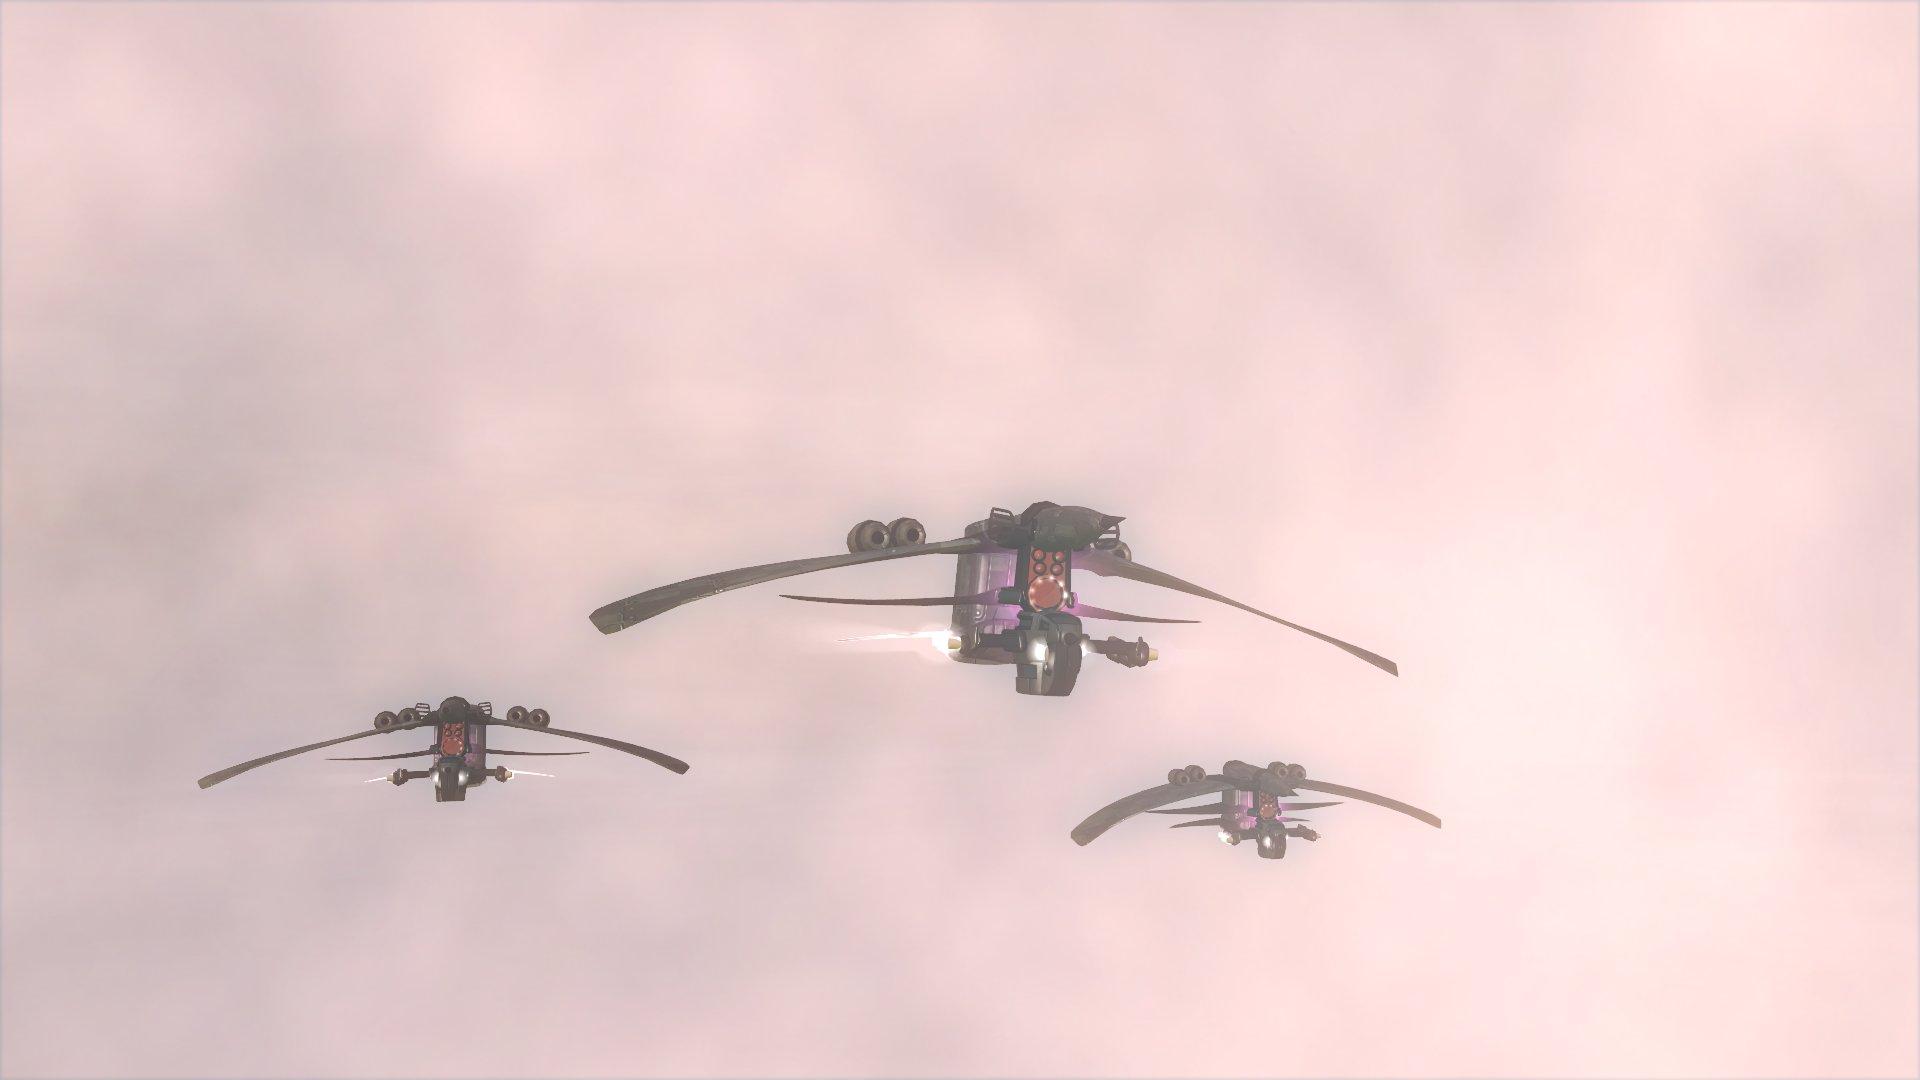 (21) Naves del imperio Neimerer Wg2sxGC